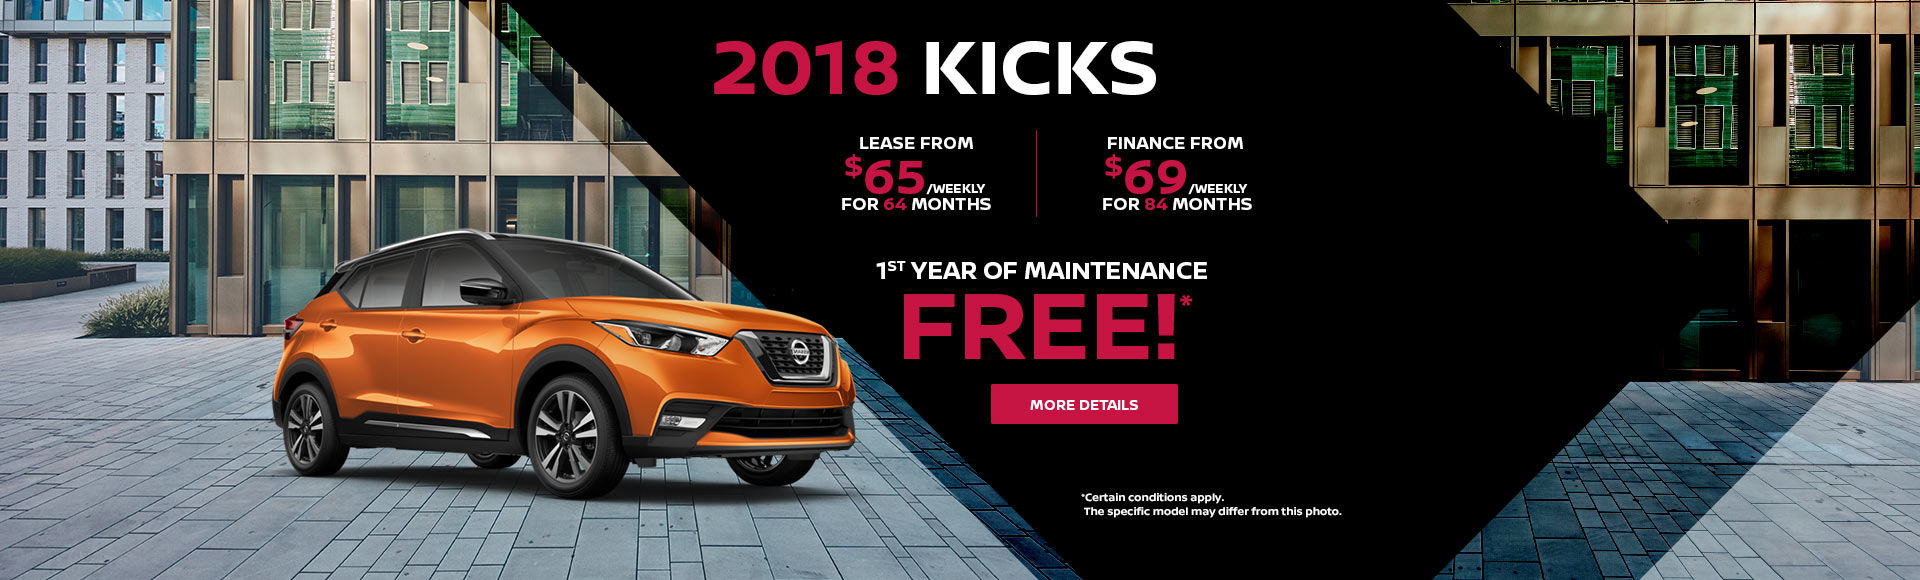 2018 Kicks Clearance